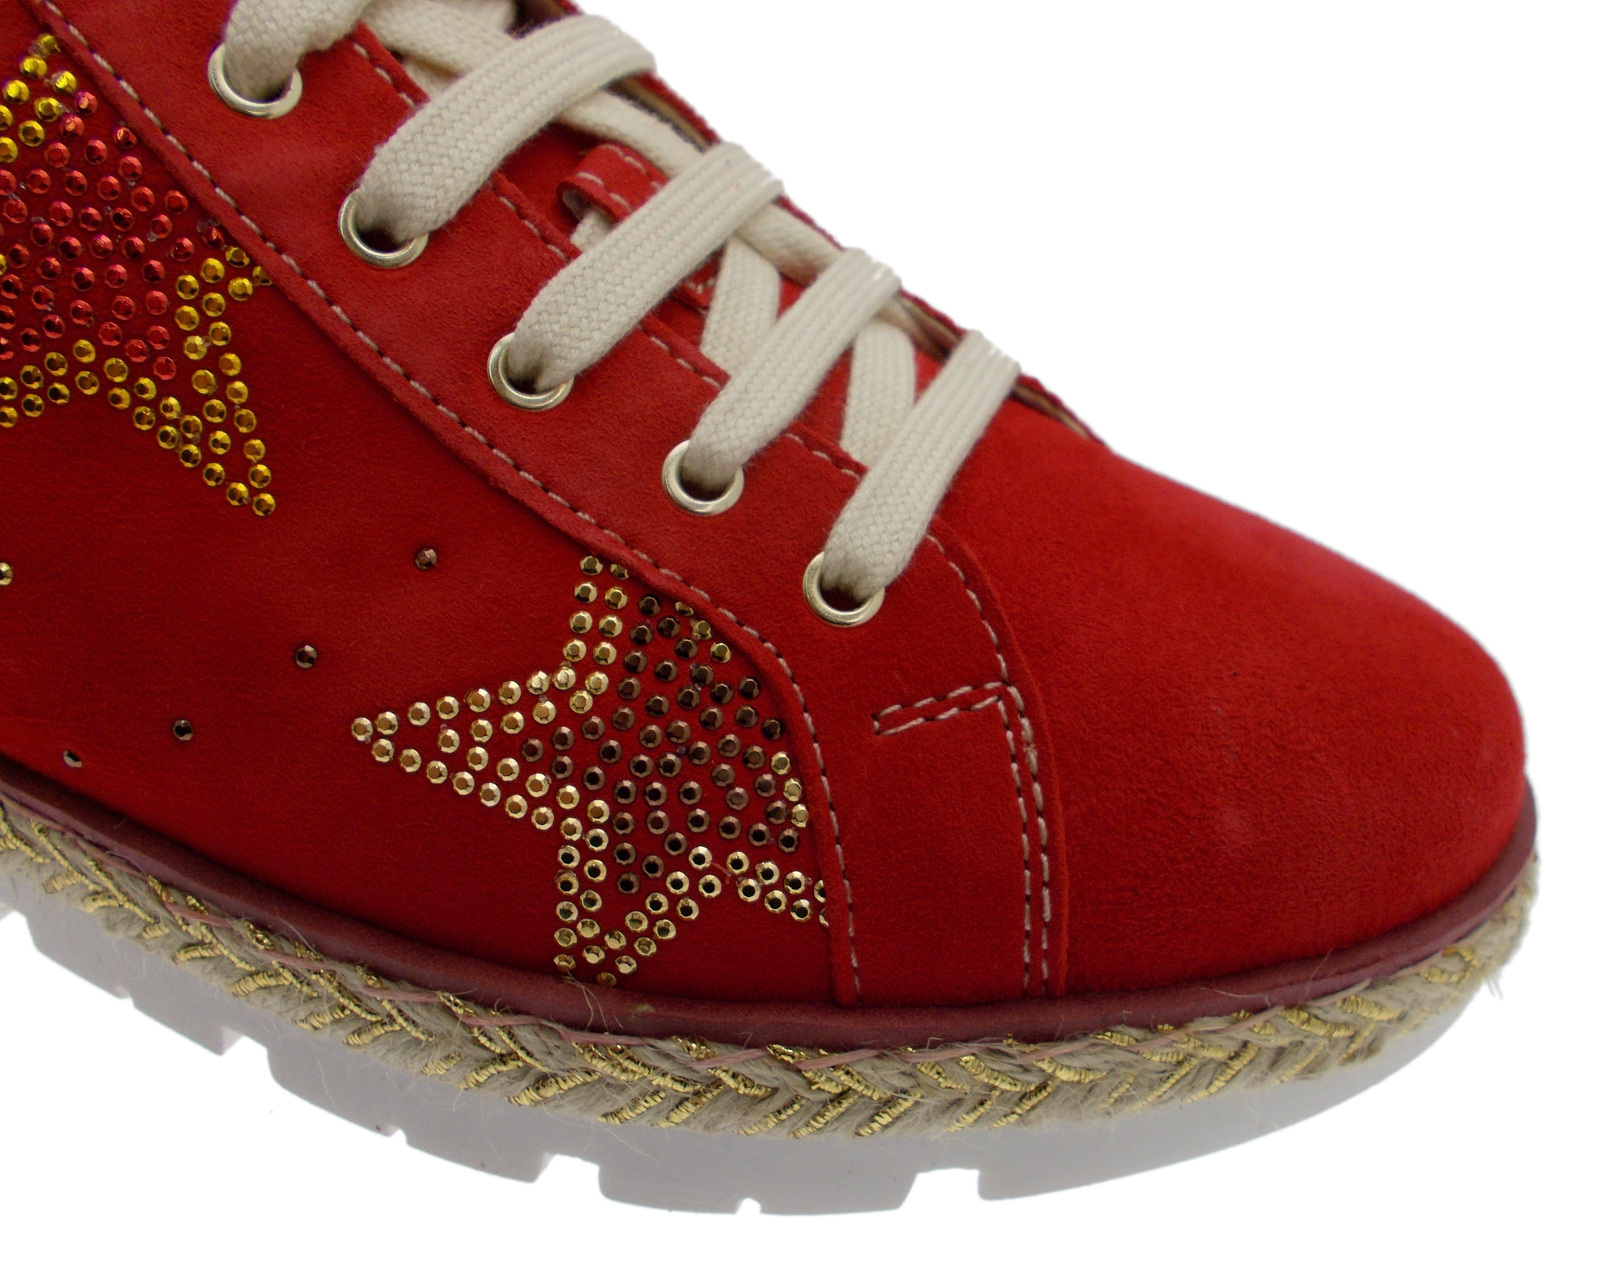 Estrella Mujer C3786 Loren extraíble Rojo Zapato Sneacker Ortopedia Plantilla xFF6n751w